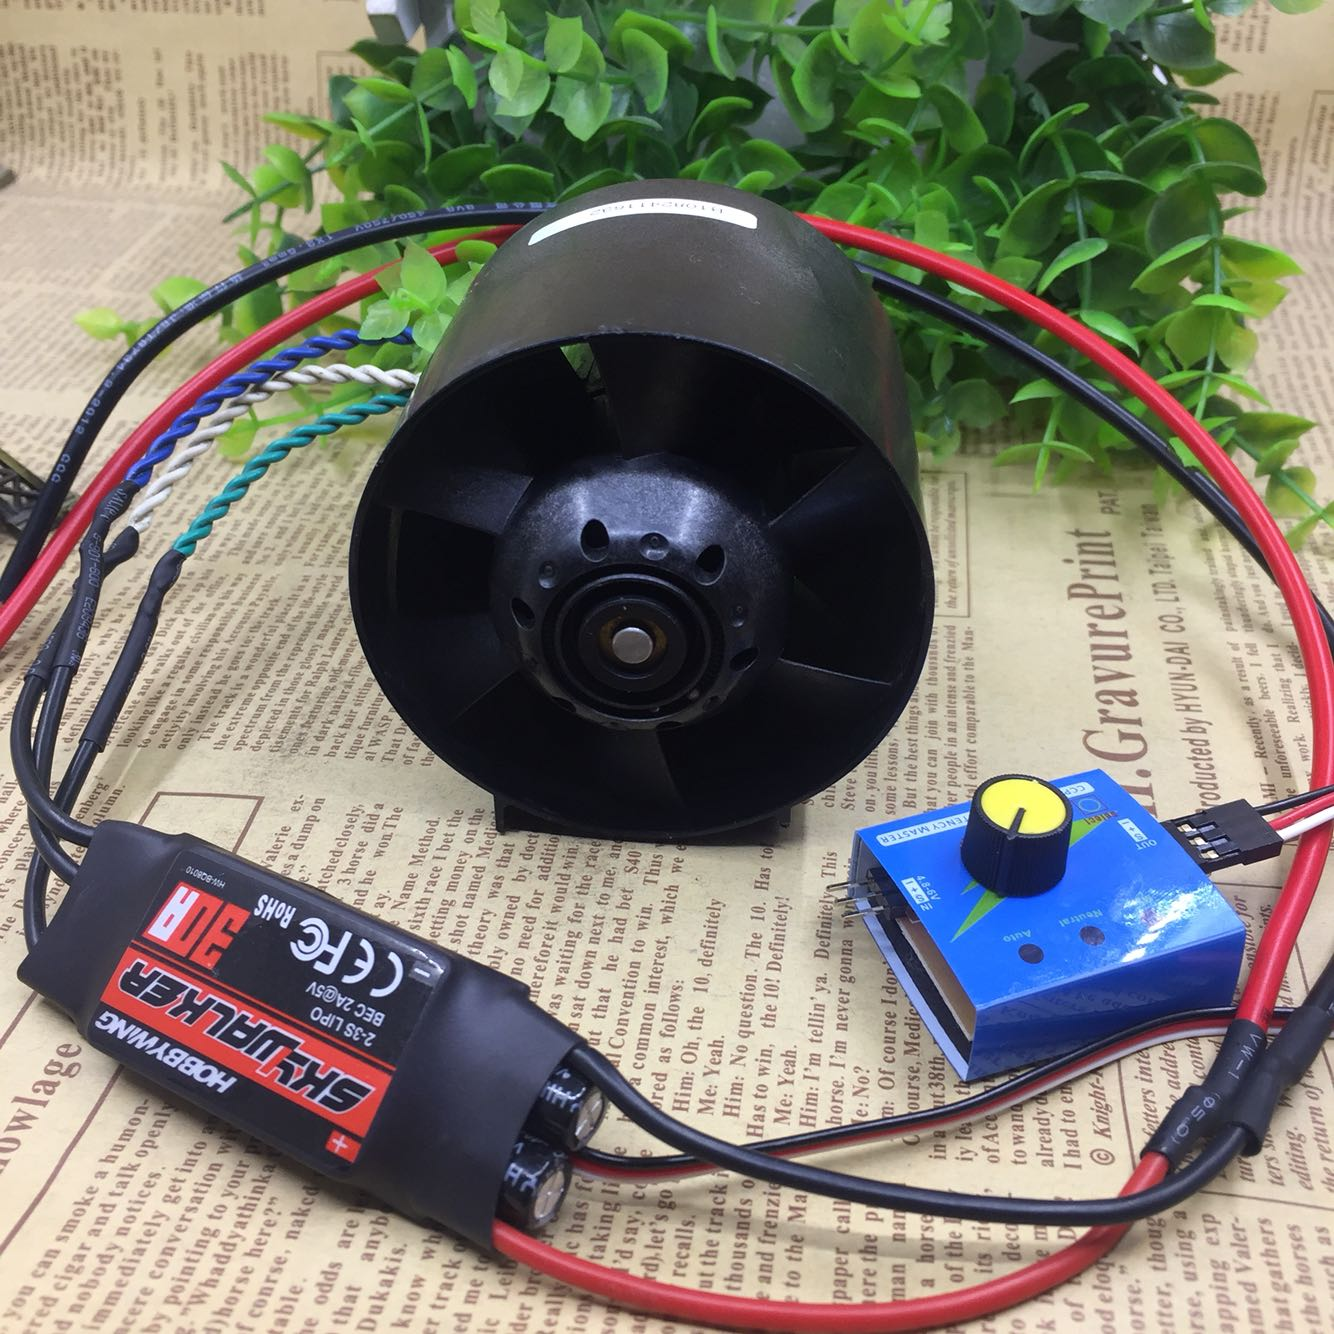 Violent All-plastic Ducted Fan Inner Rotor DC Brushless Motor High-speed Turbo Fan 12V 7A